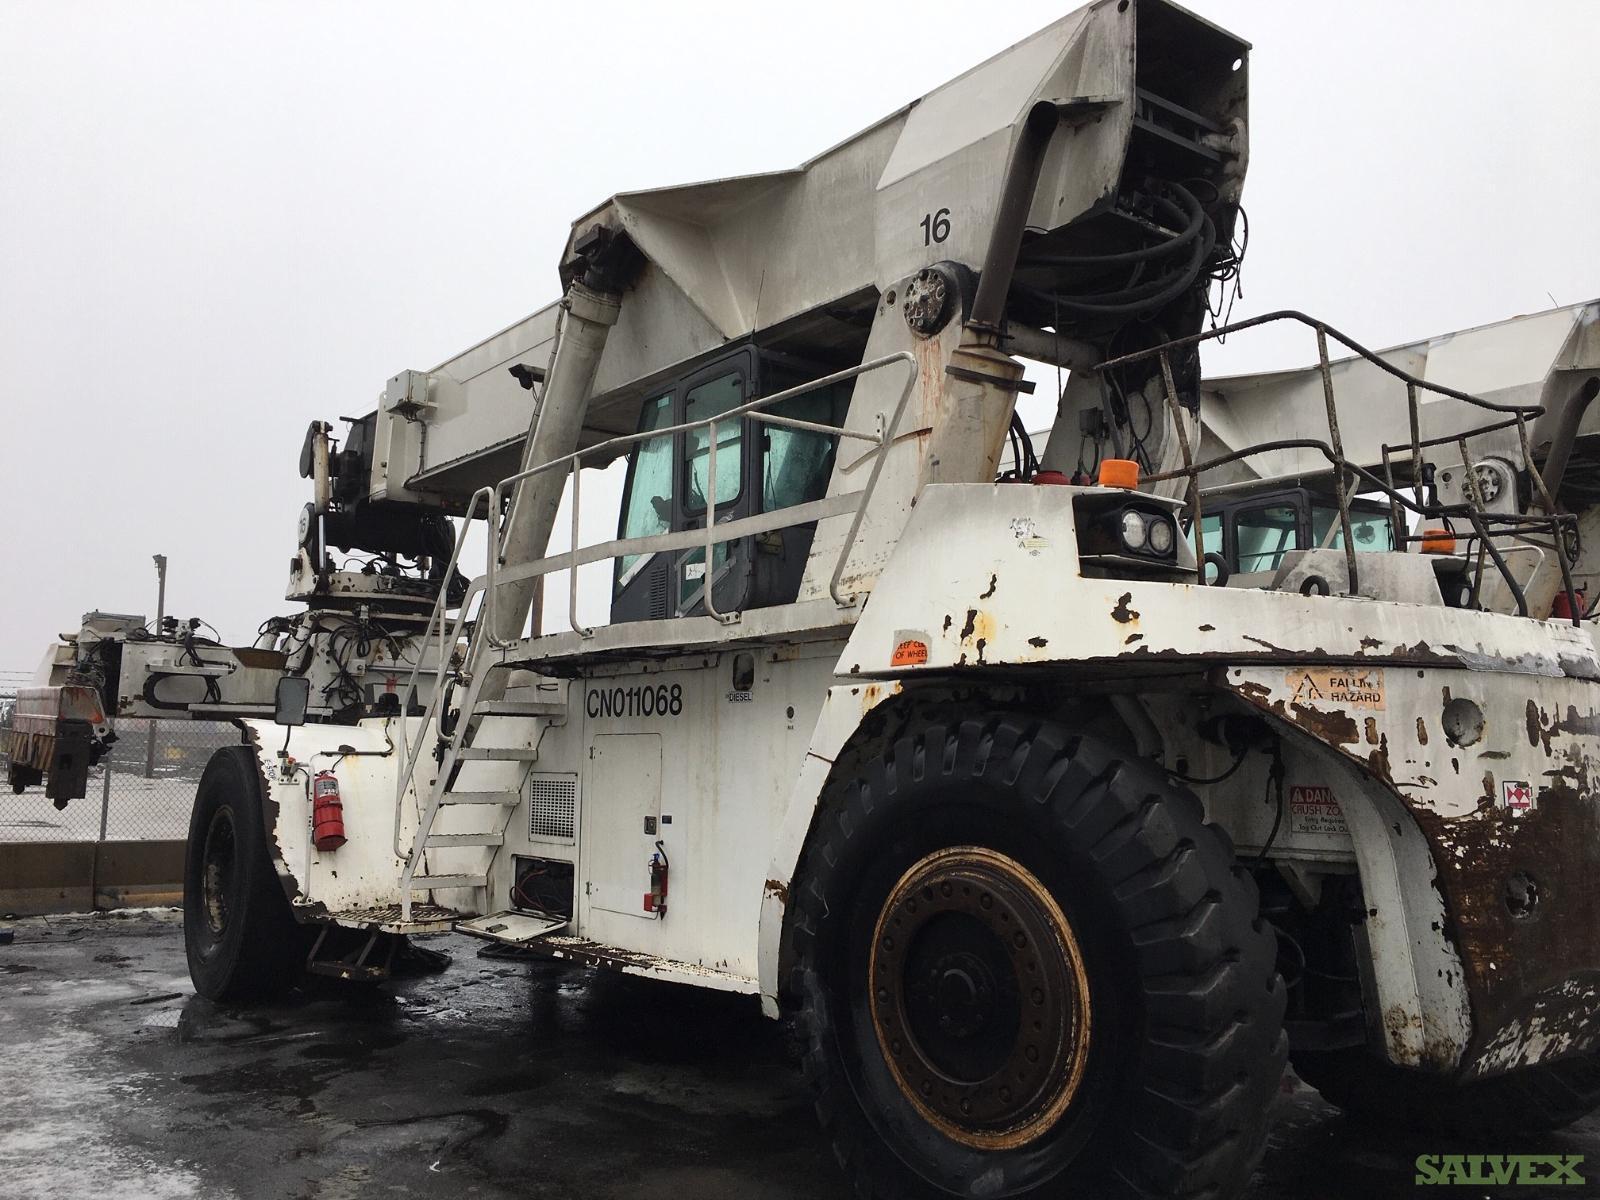 Terex RS55 Reachstacker Crane -11068- 2011 (1 Unit) in Chicago, Illinois